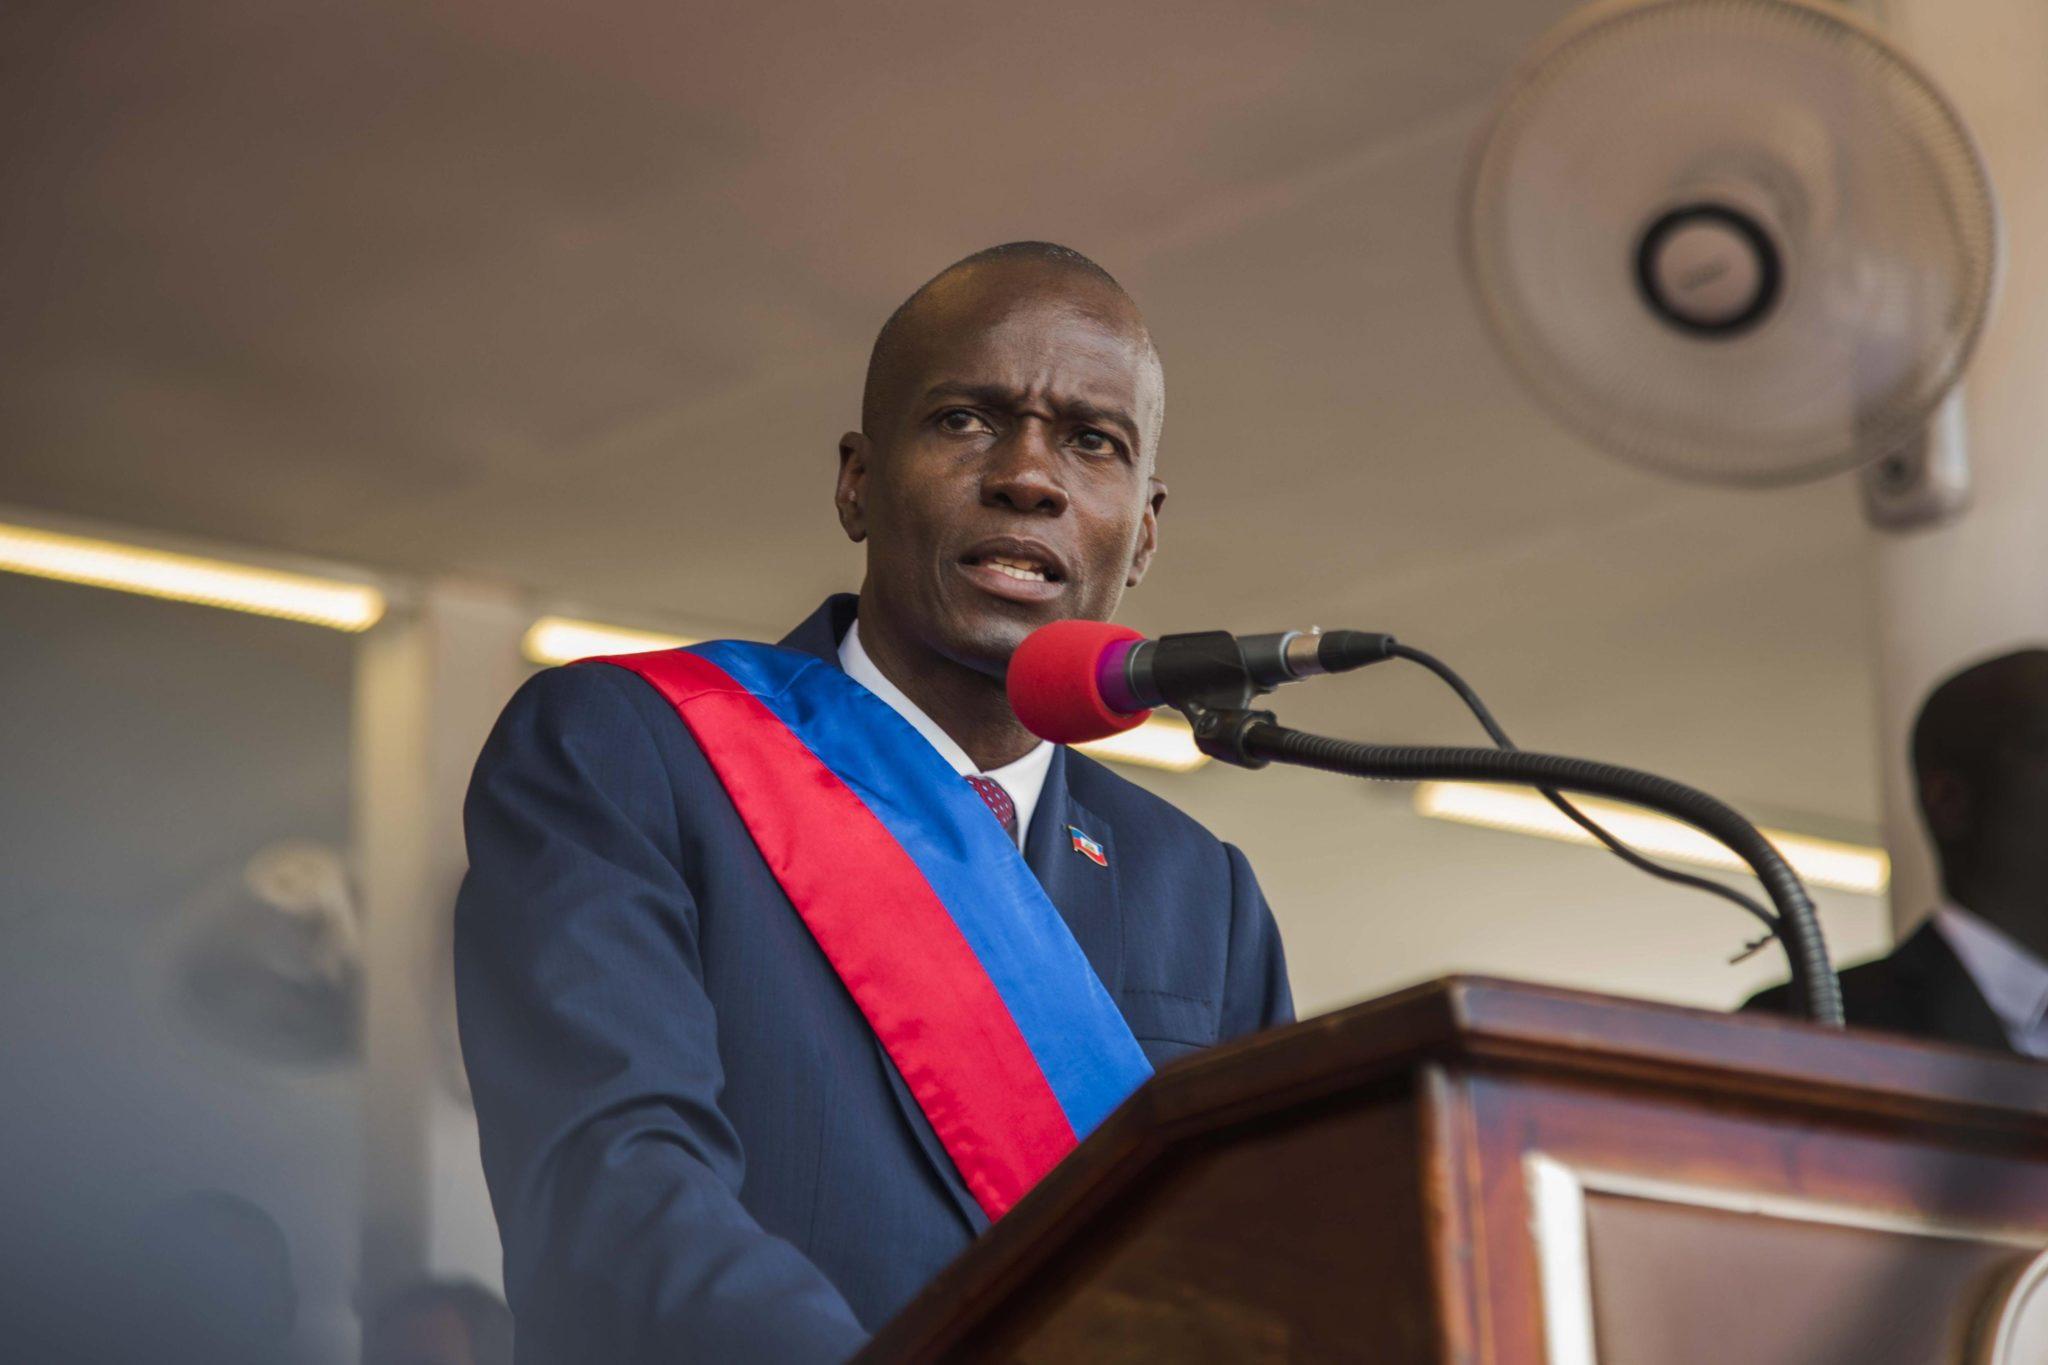 Haiti: ceremonia inauguracji prezydentury 58 prezydenta Haiti w Port au Prince (fotp. PAP/EPA/JEAN MARC HERVE ABELARD)